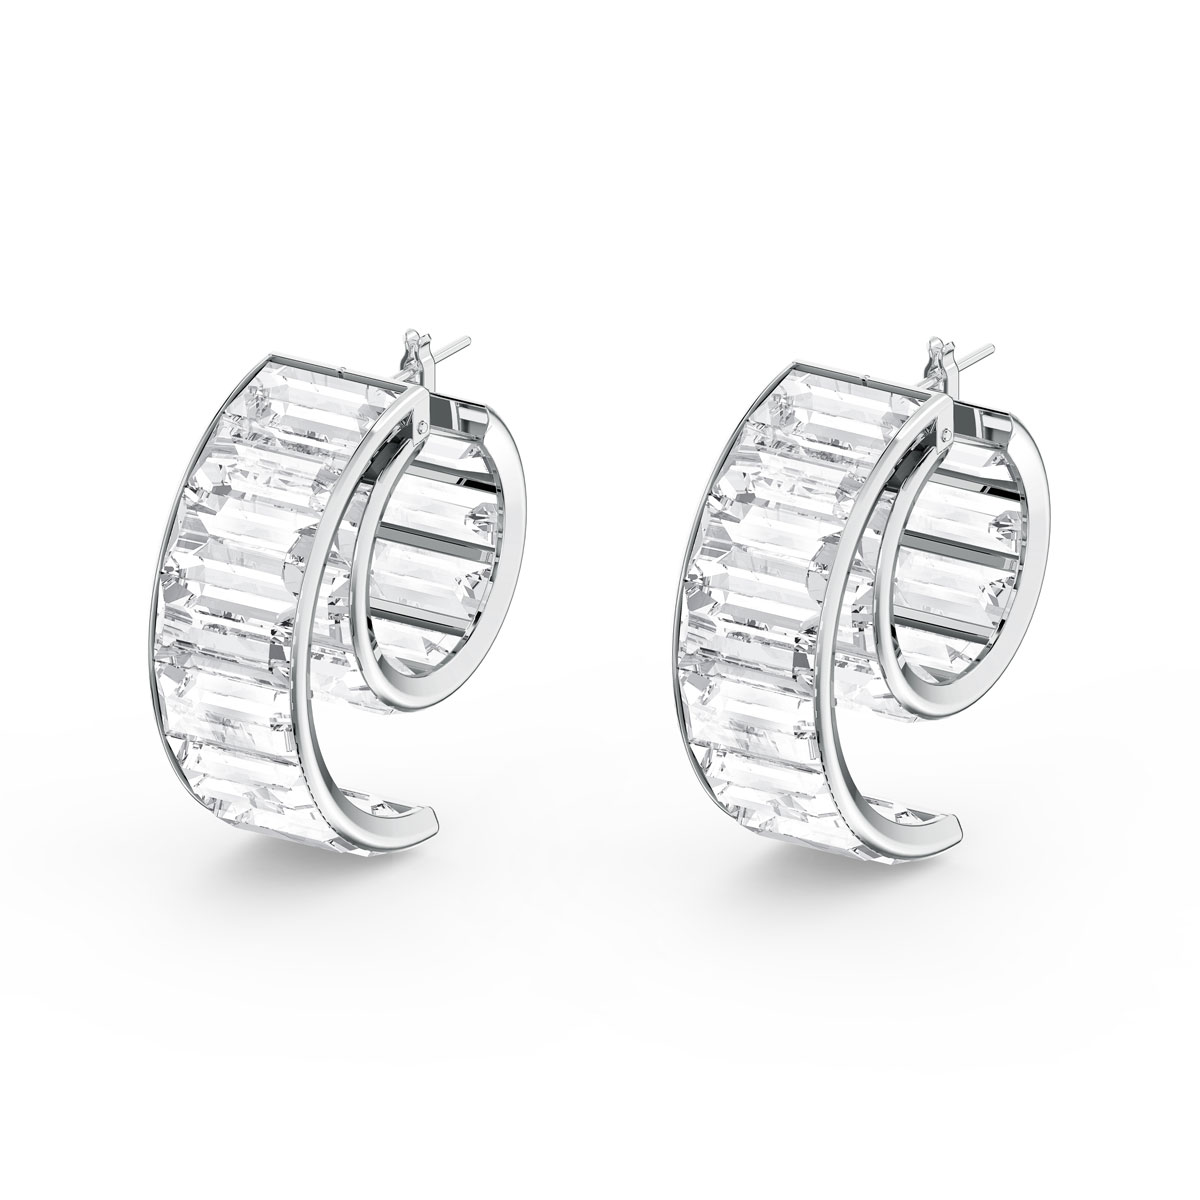 Swarovski Matrix Earrings, White, Rhodium Plated, Pair